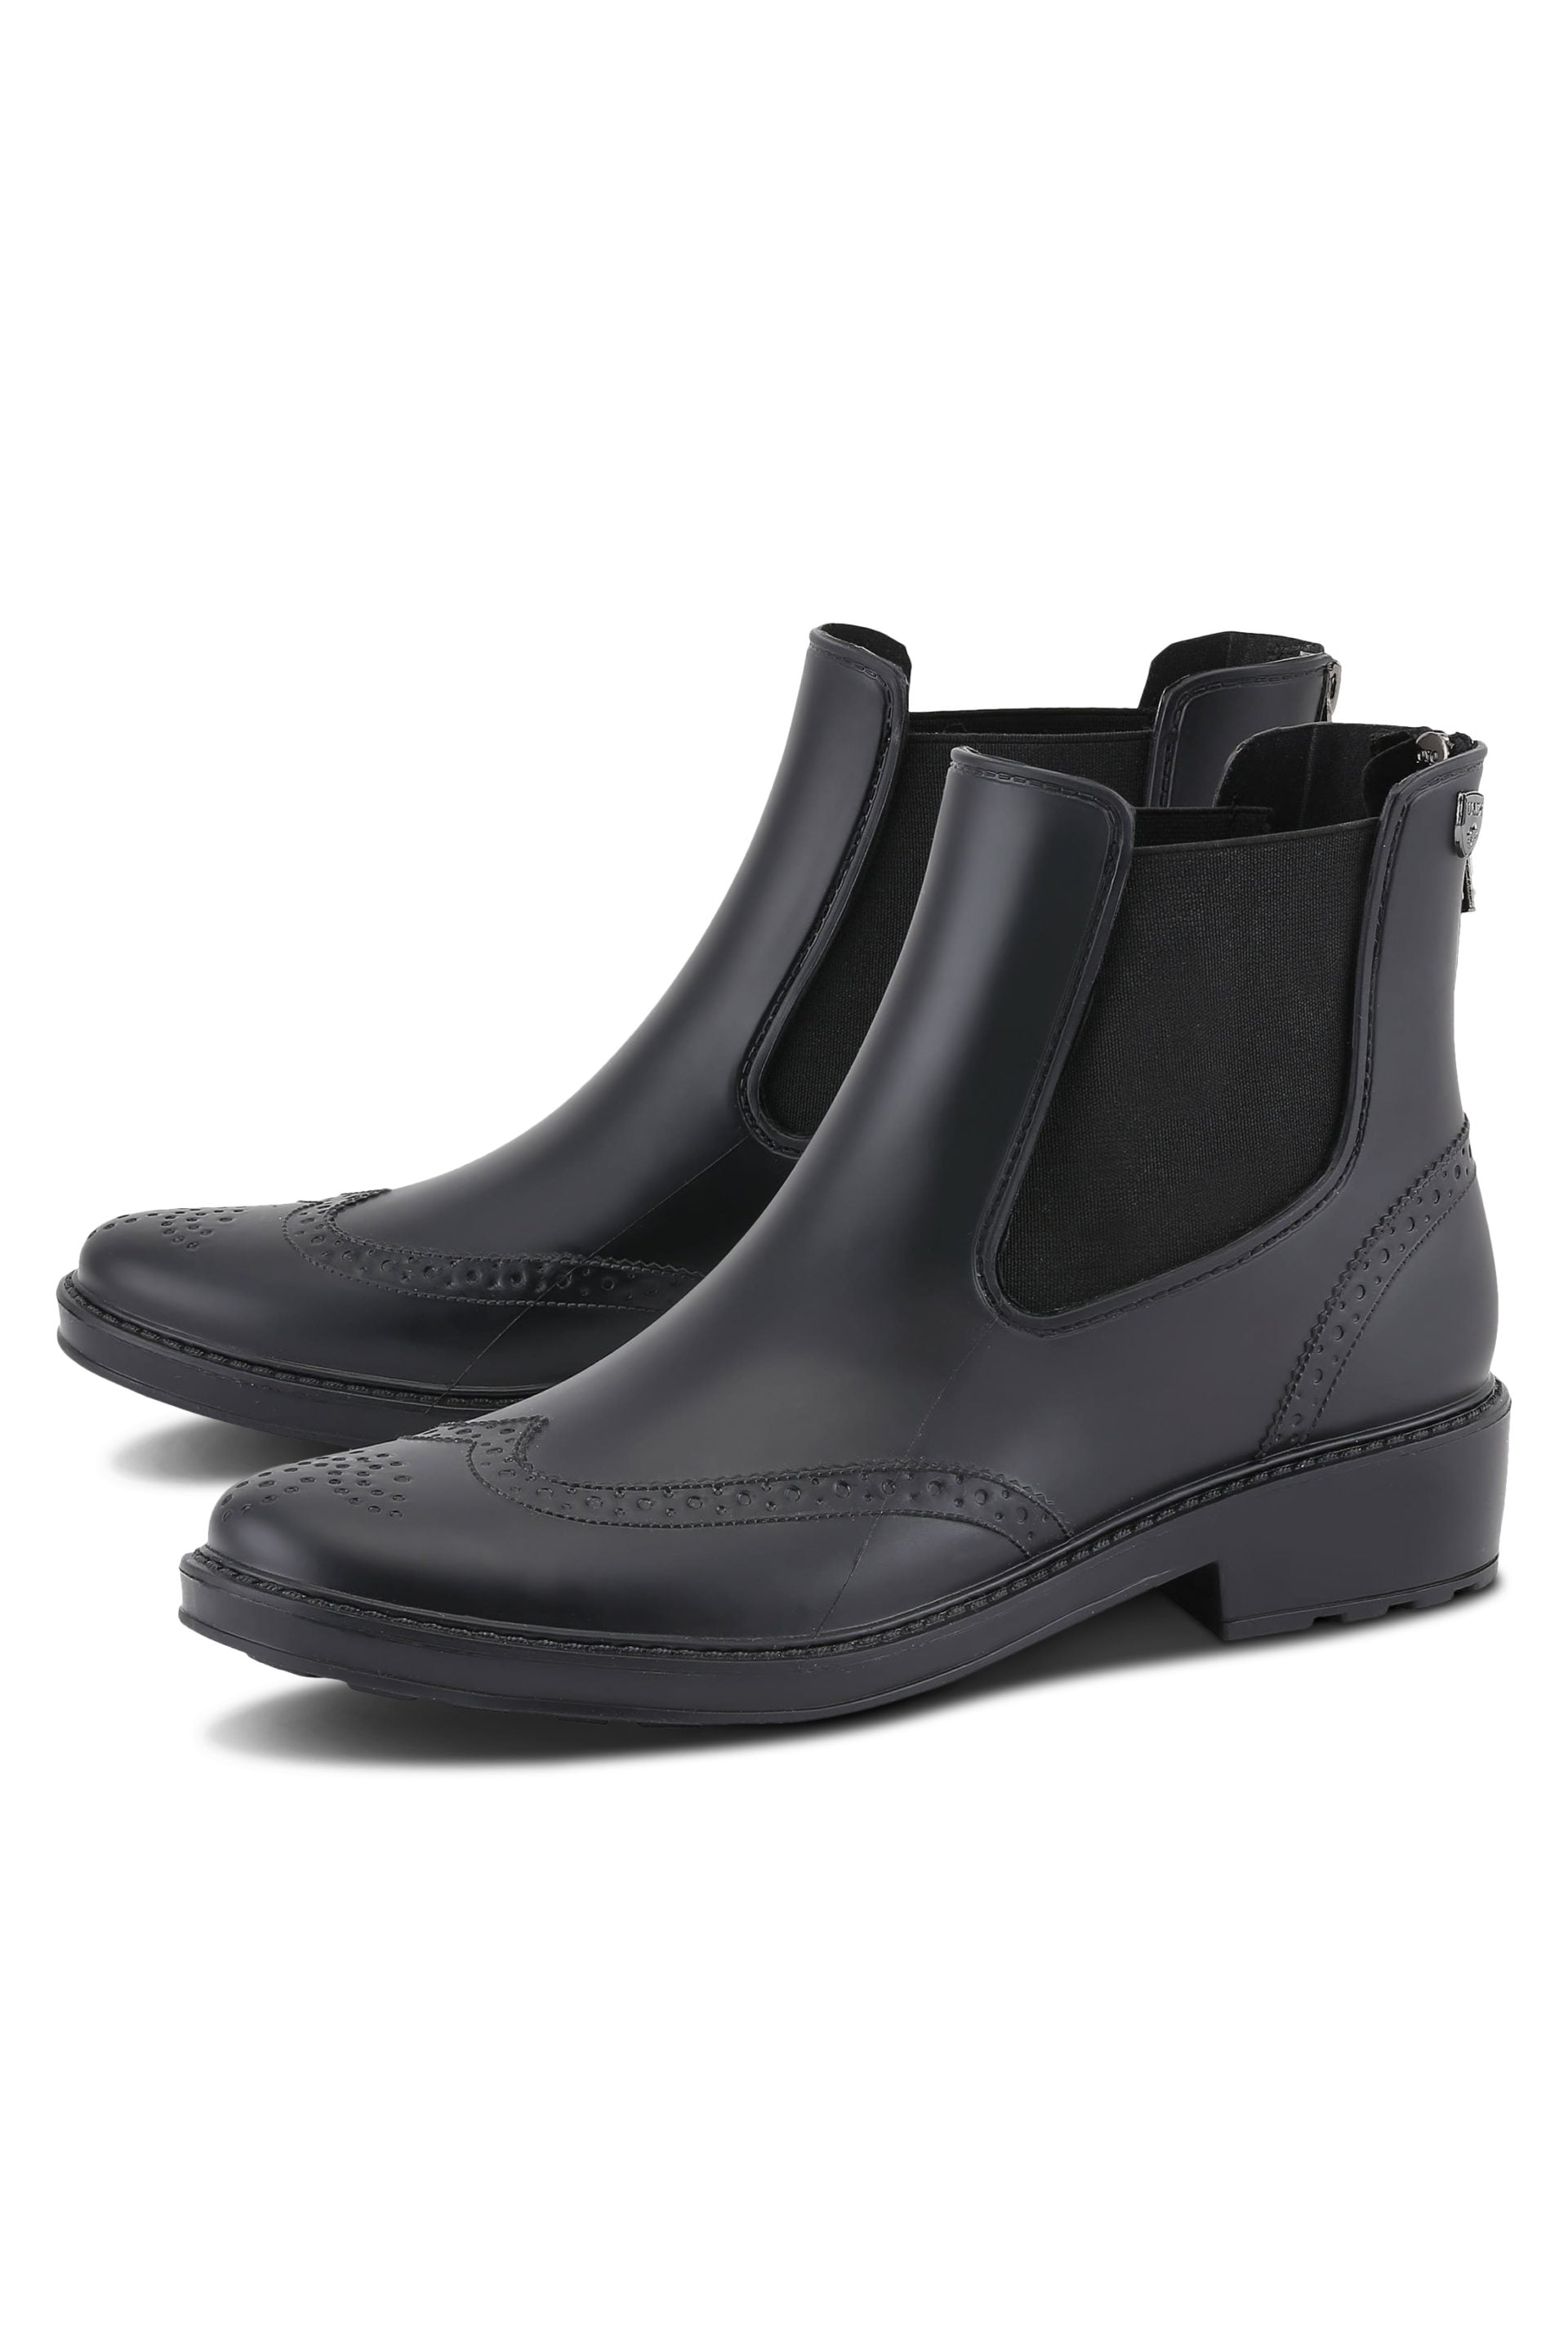 Chelsea rainboots in matte black